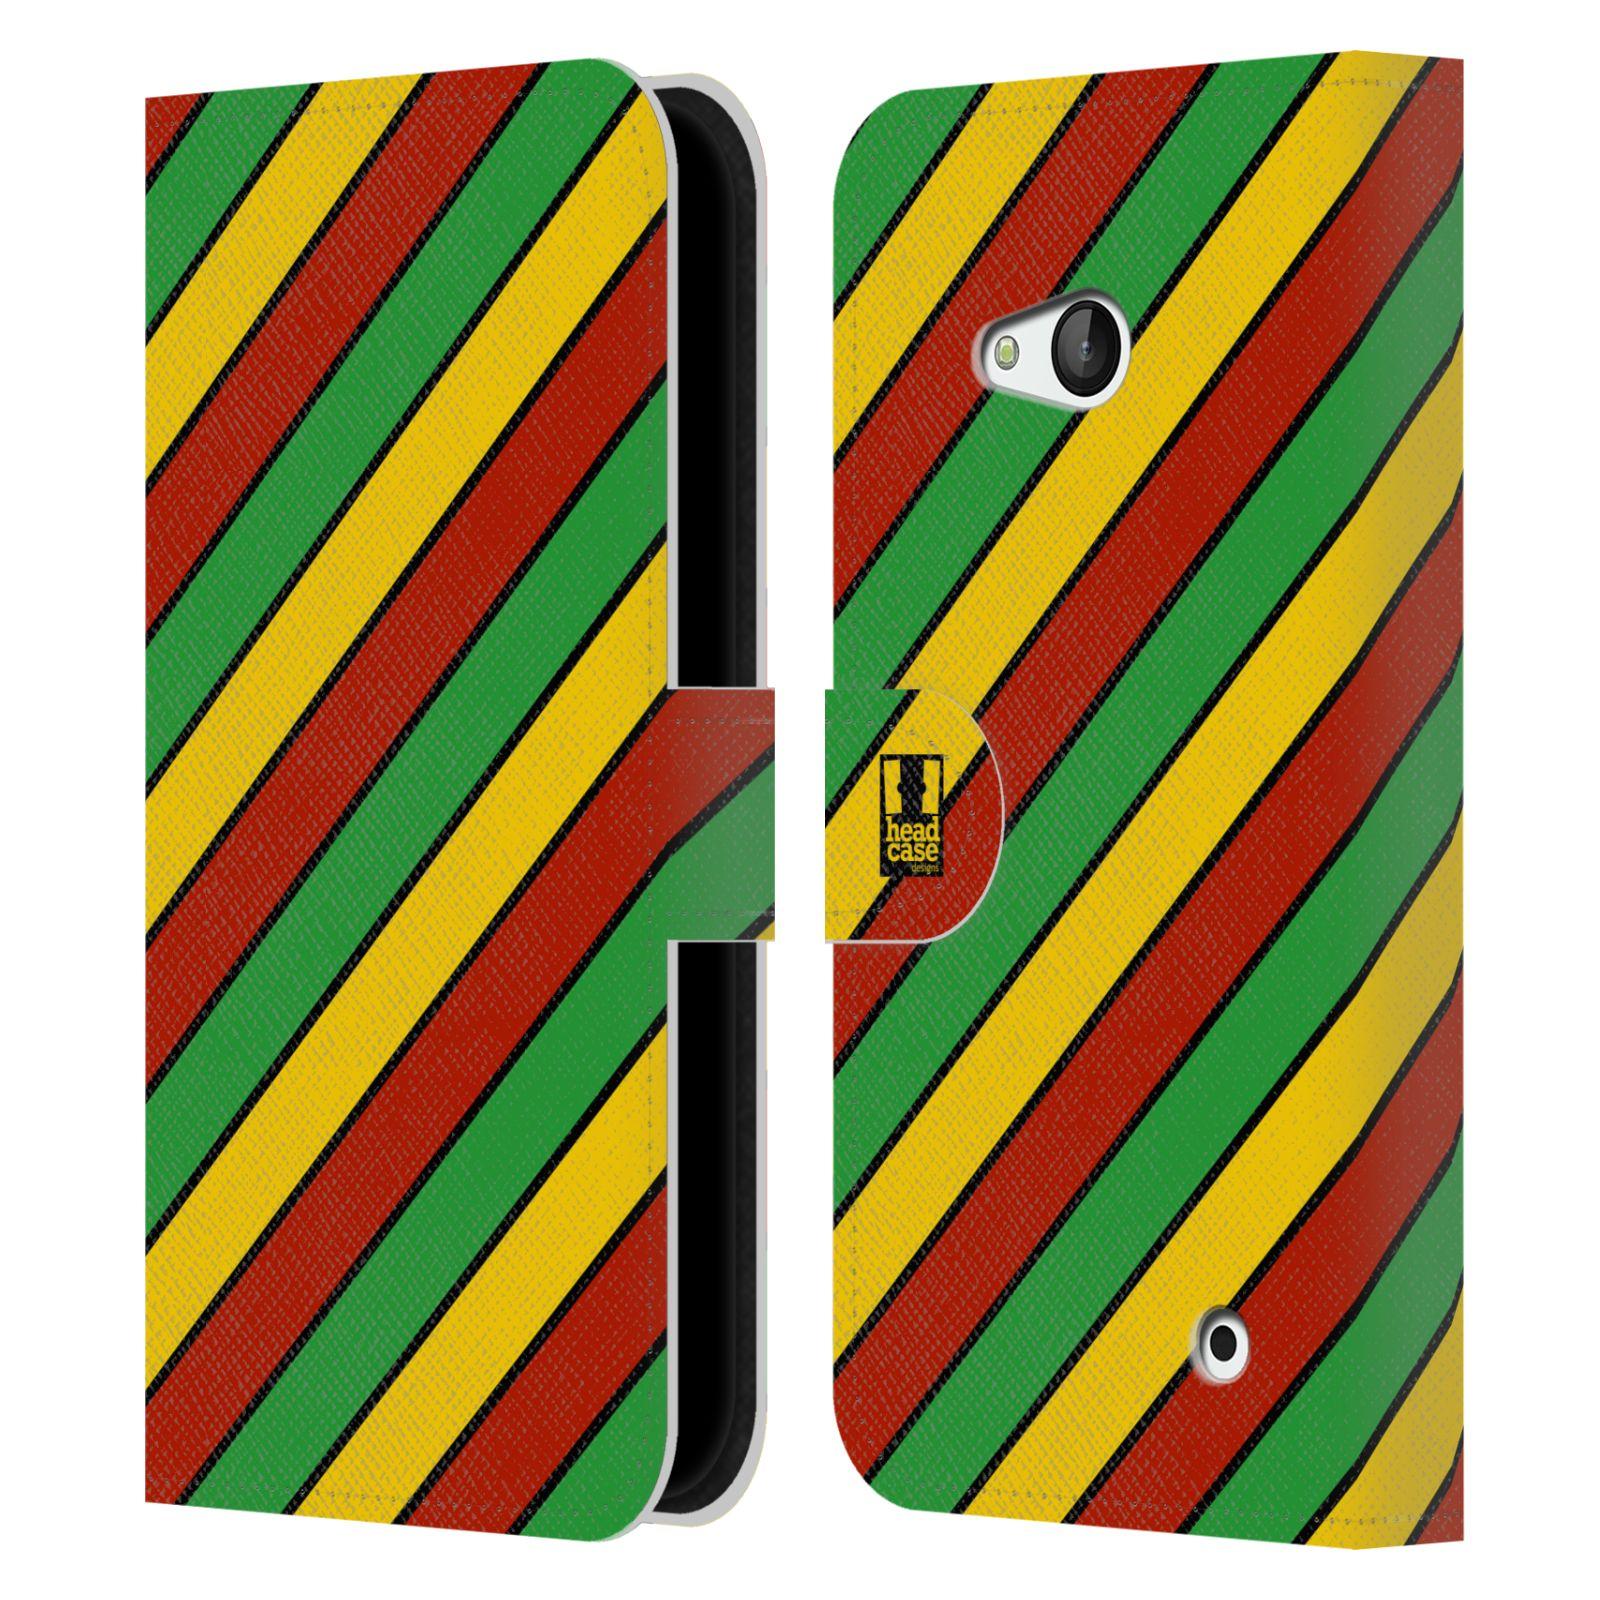 HEAD CASE Flipové pouzdro pro mobil NOKIA / MICROSOFT LUMIA 640 / LUMIA 640 DUAL Rastafariánský motiv Jamajka diagonální pruhy